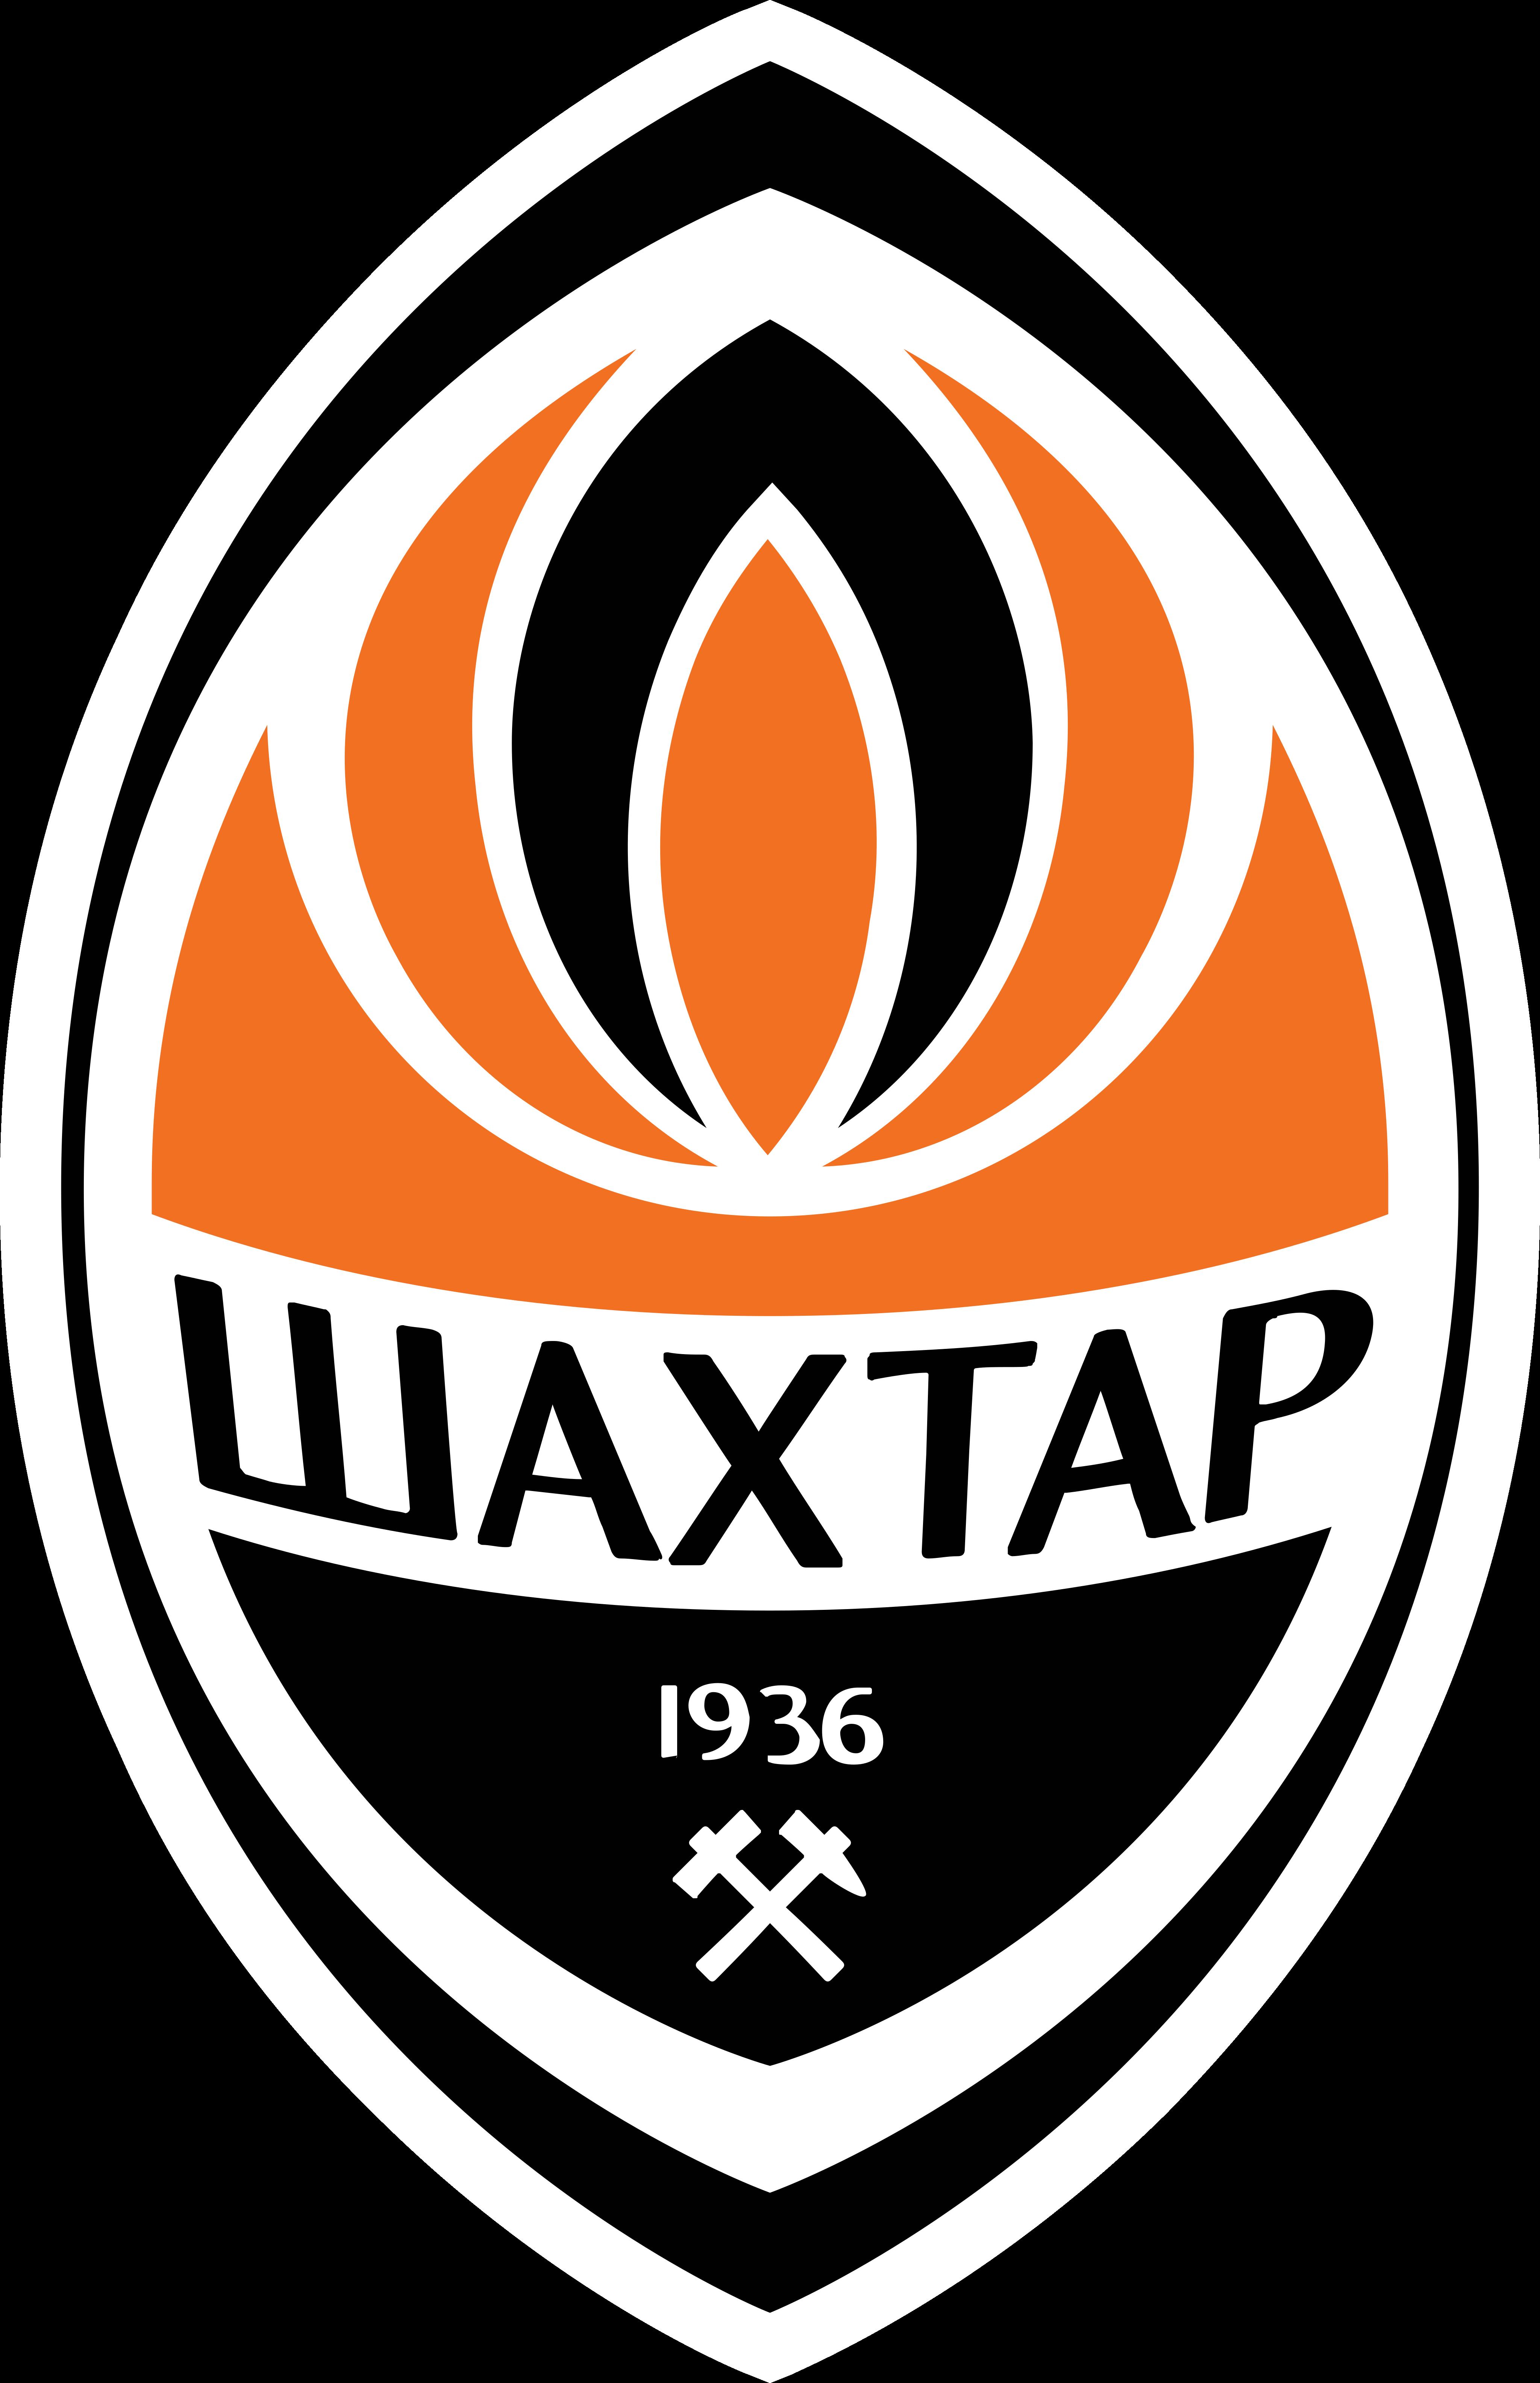 shakhtar logo - FK Shakhtar Logo - Escudo